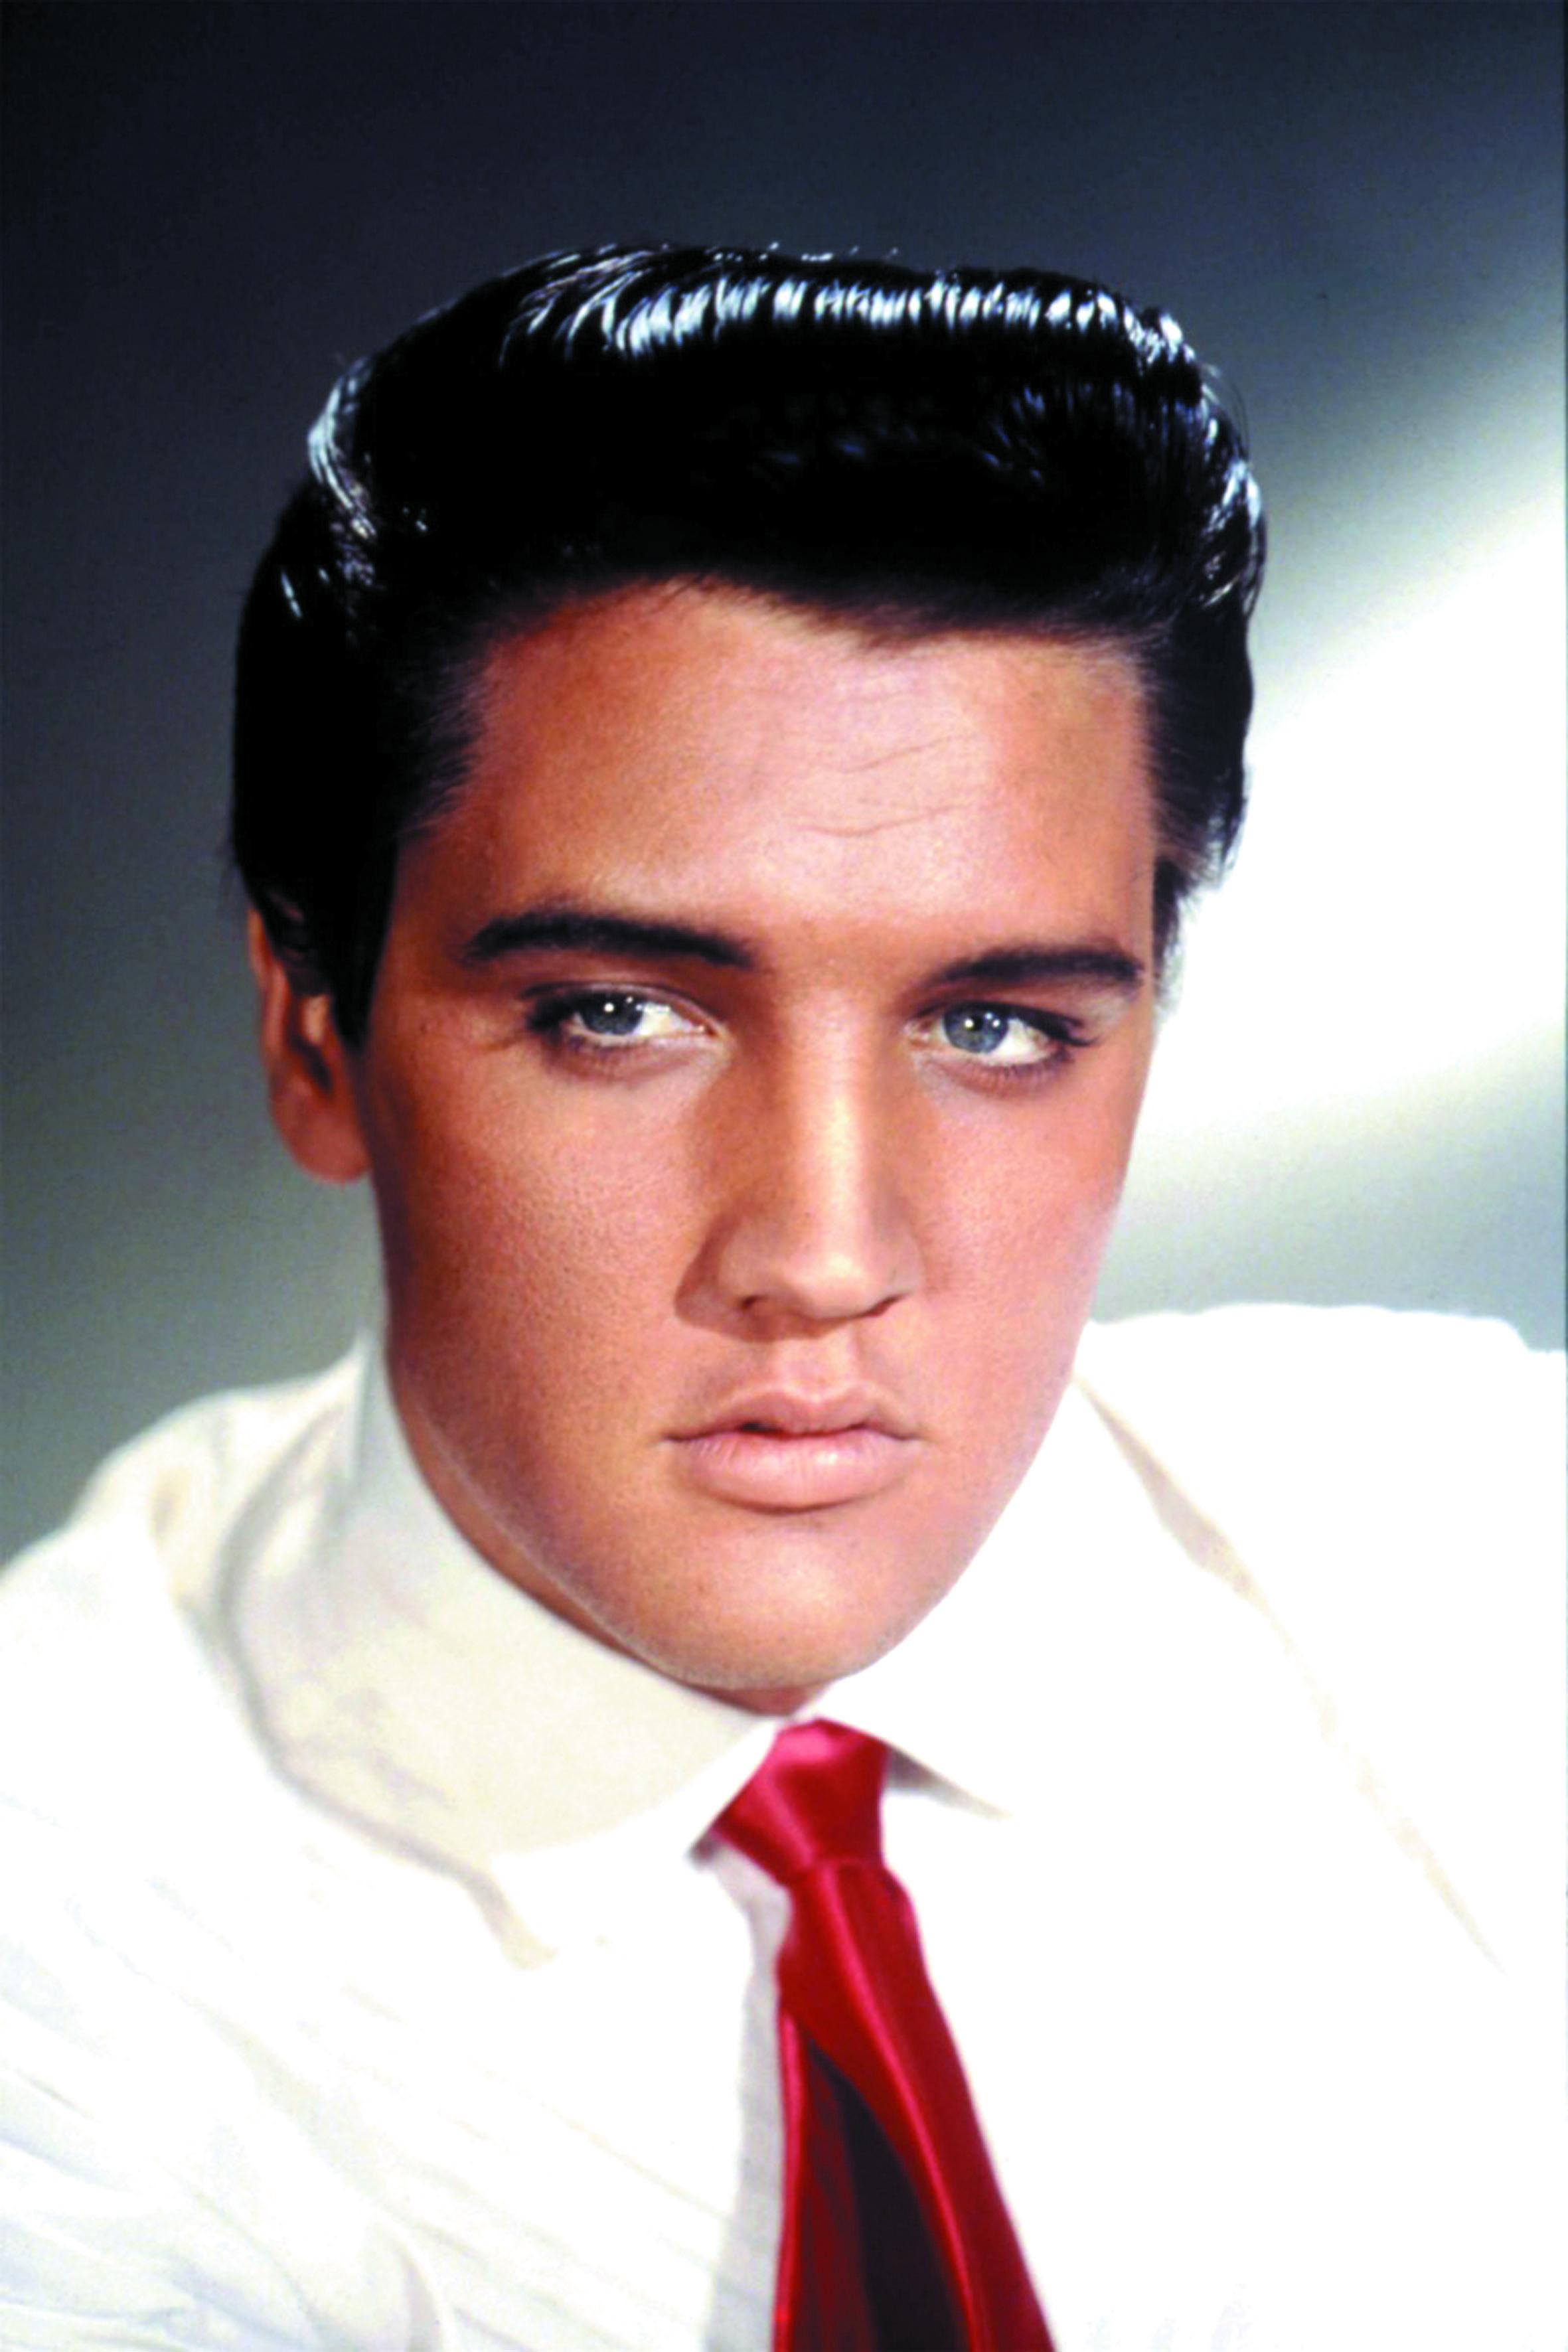 Pseudos de stars pour passer incognito : Elvis Presley